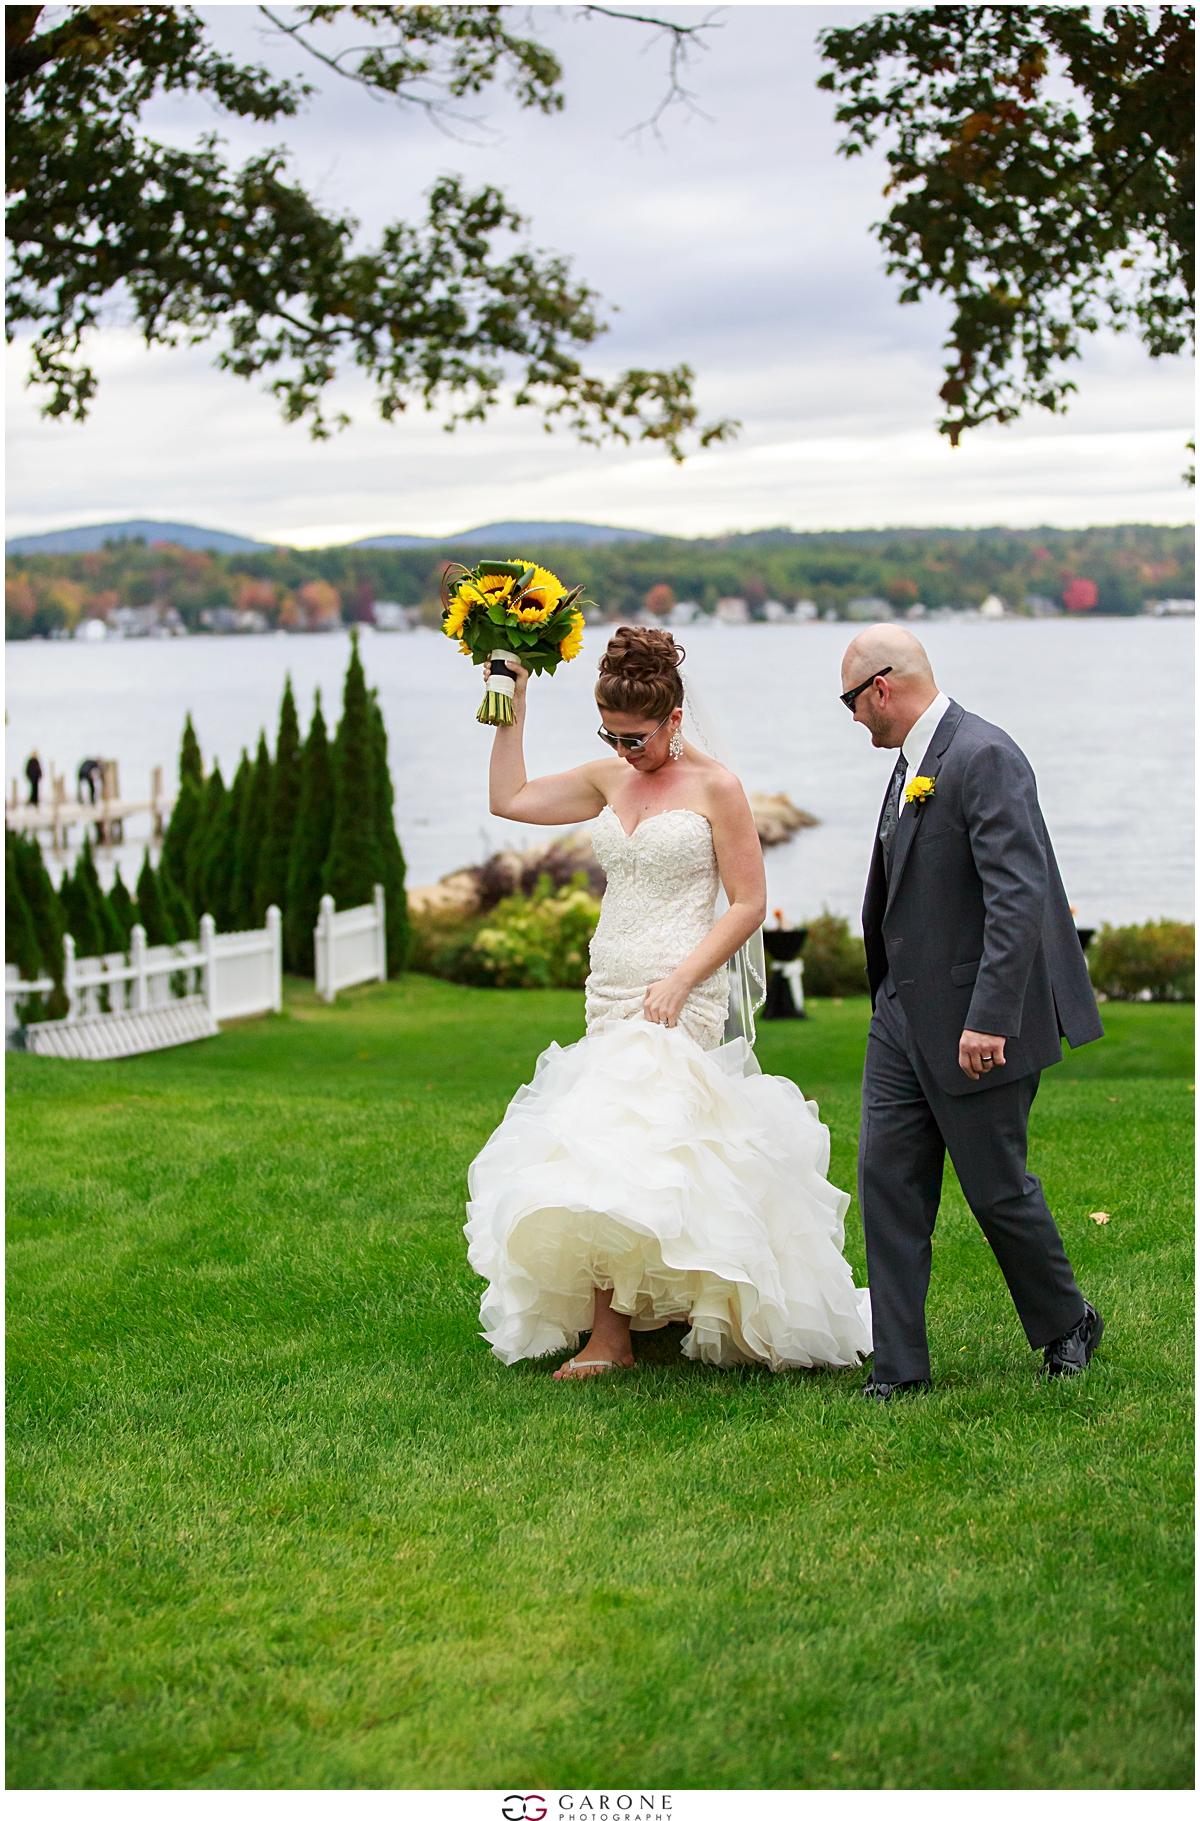 Garone_Photography_The Margate_Wedding_Lake Winnipasaukee_Wedding_0007.jpg